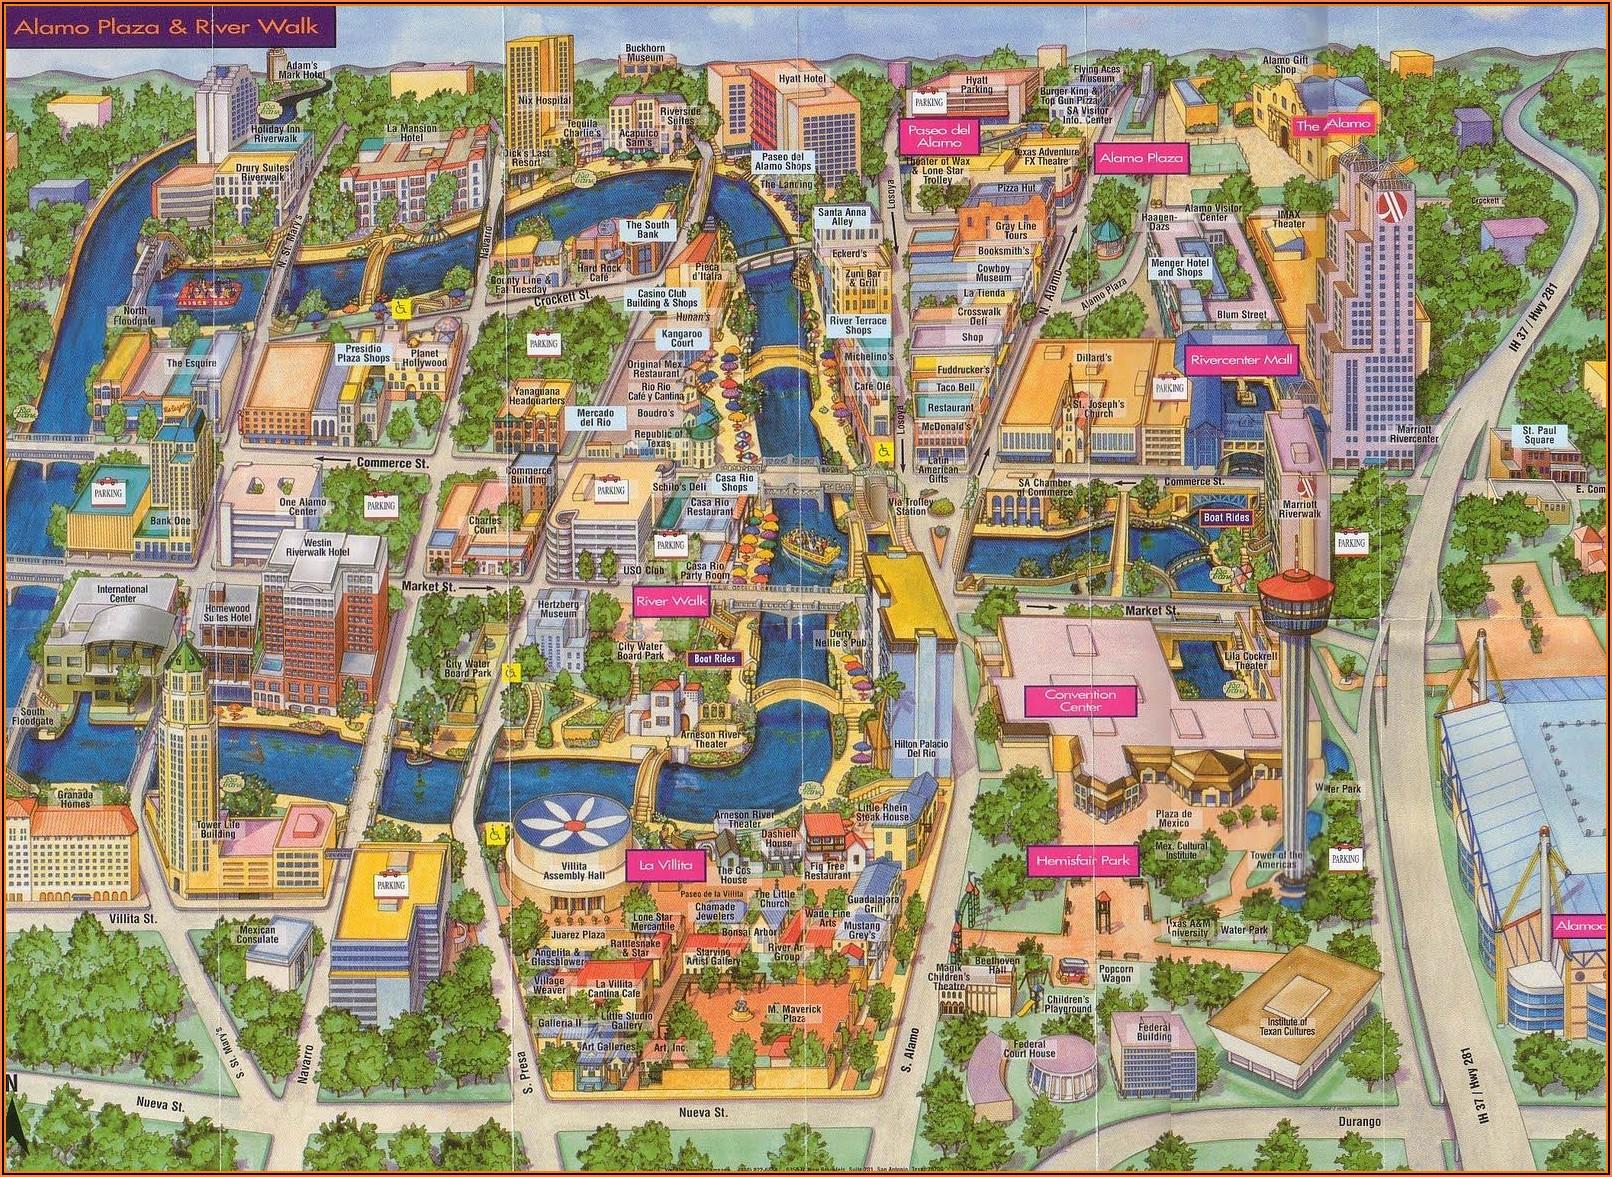 Map Of Hotels On The Riverwalk In San Antonio Texas